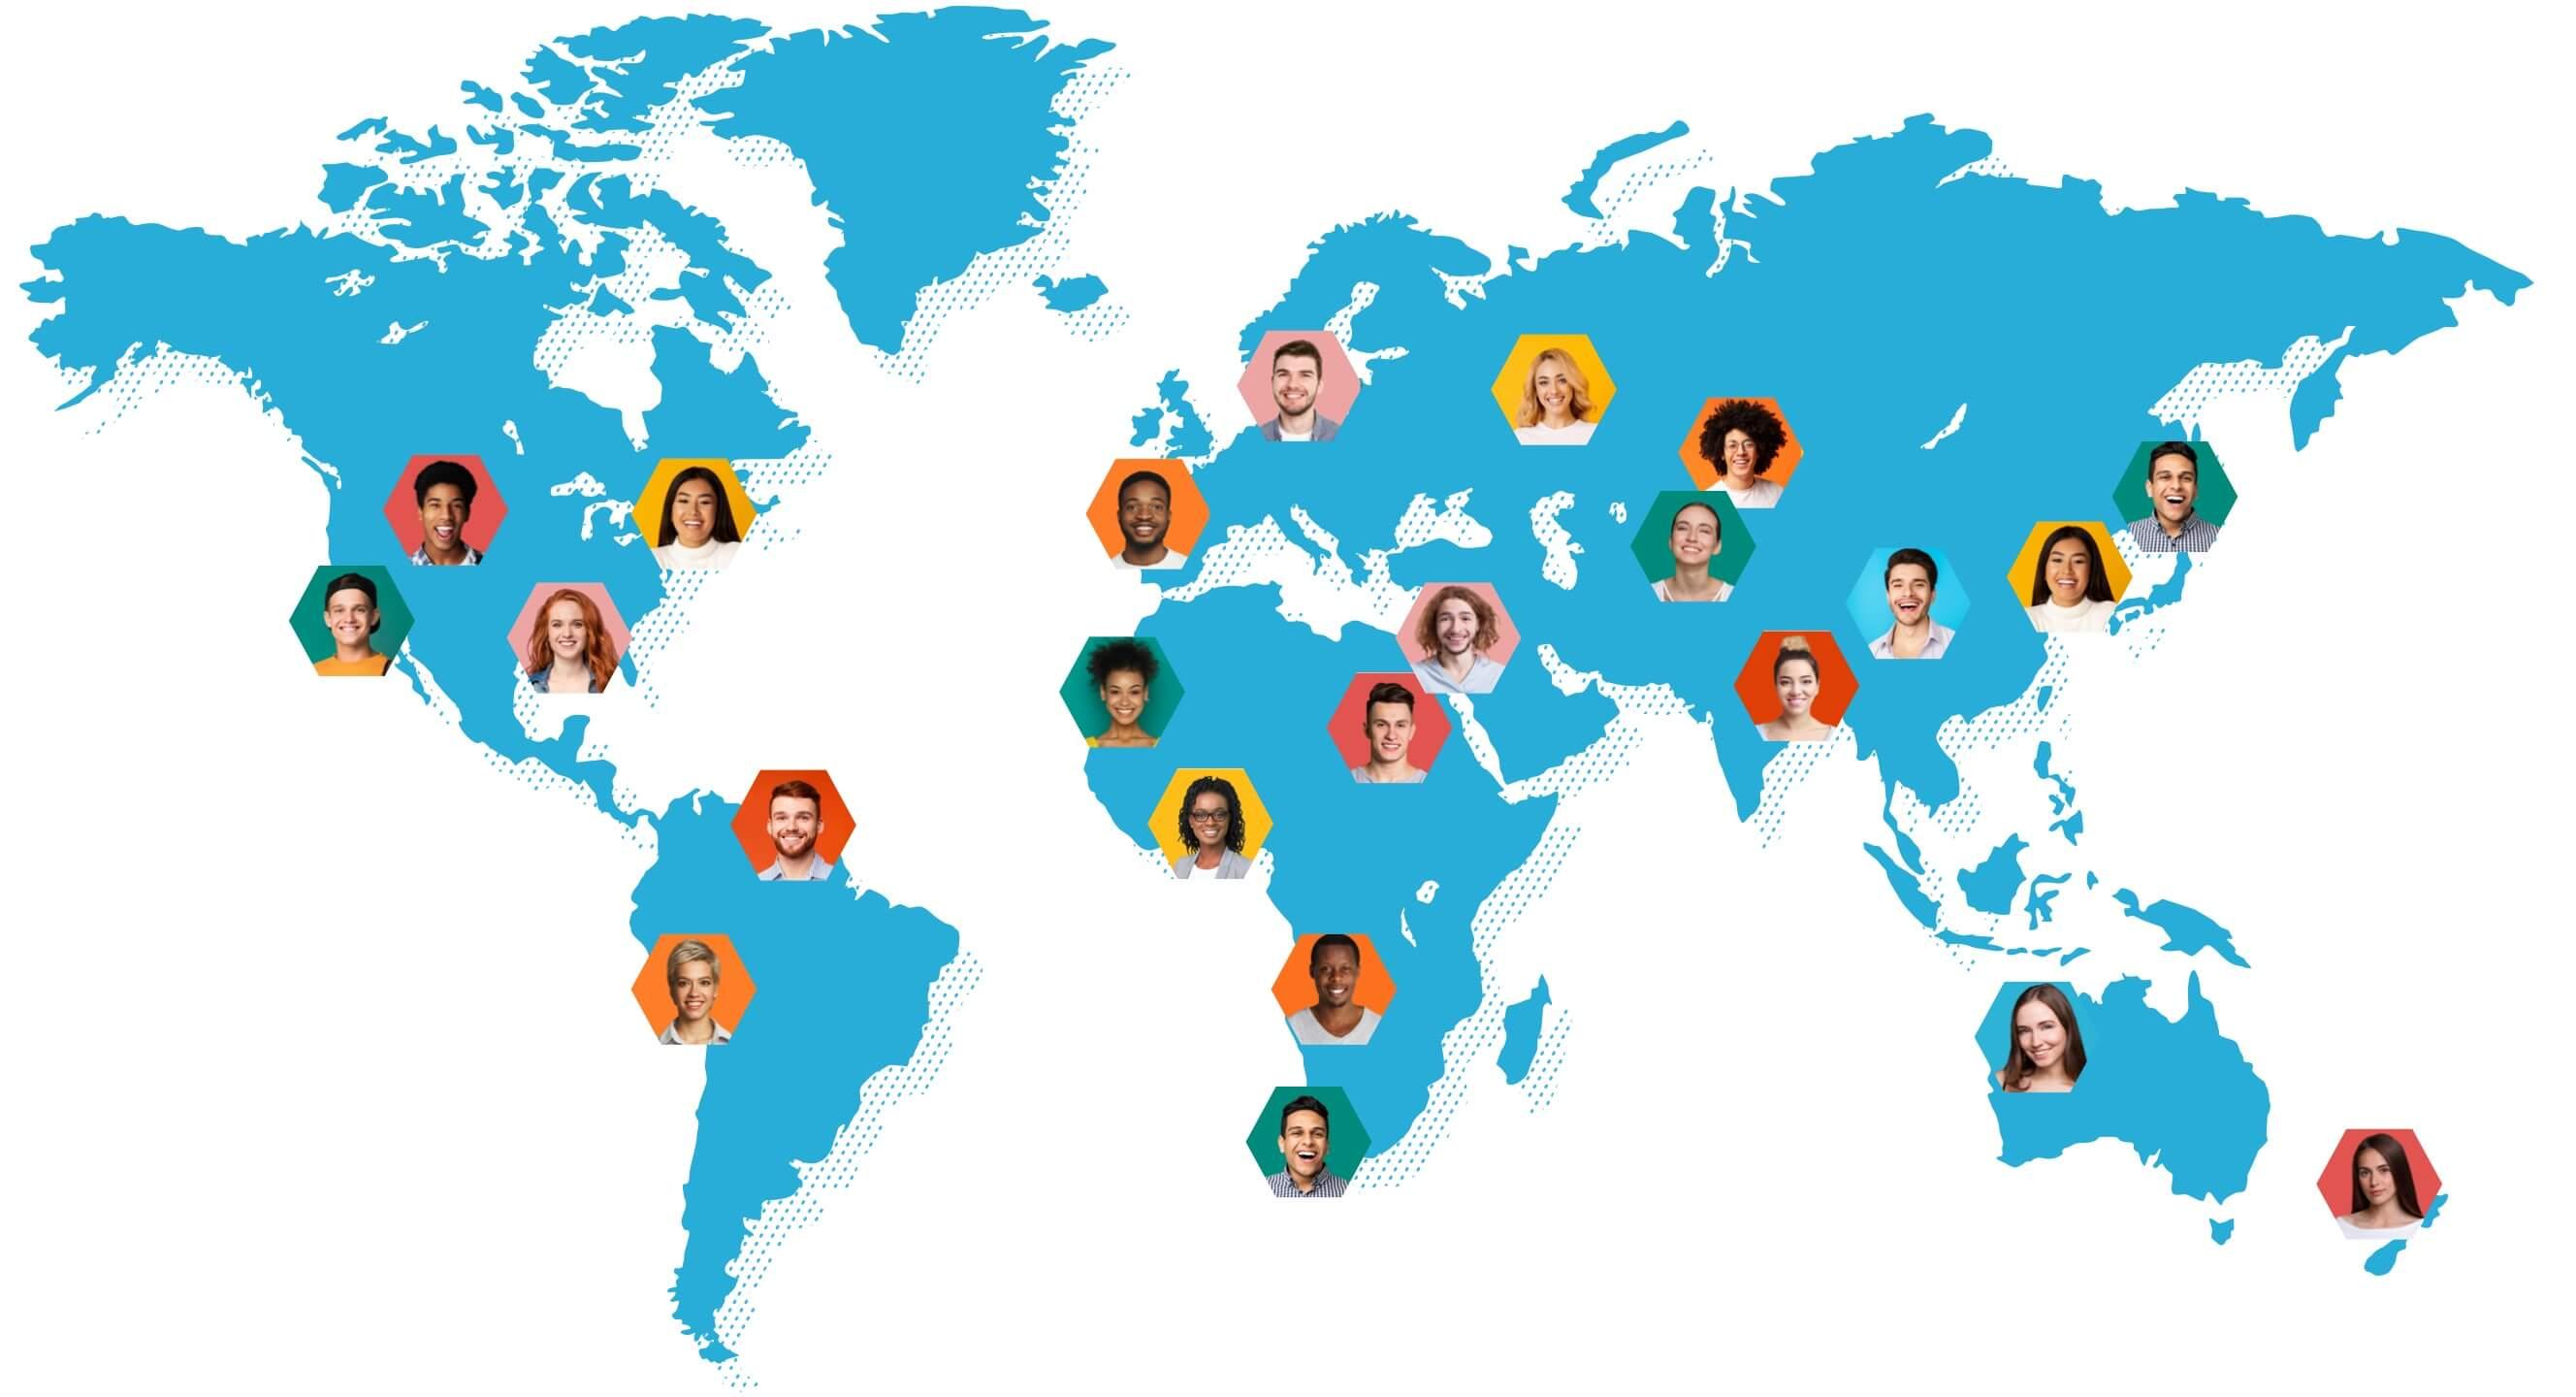 crowdsource-globe-image-full-03@2x